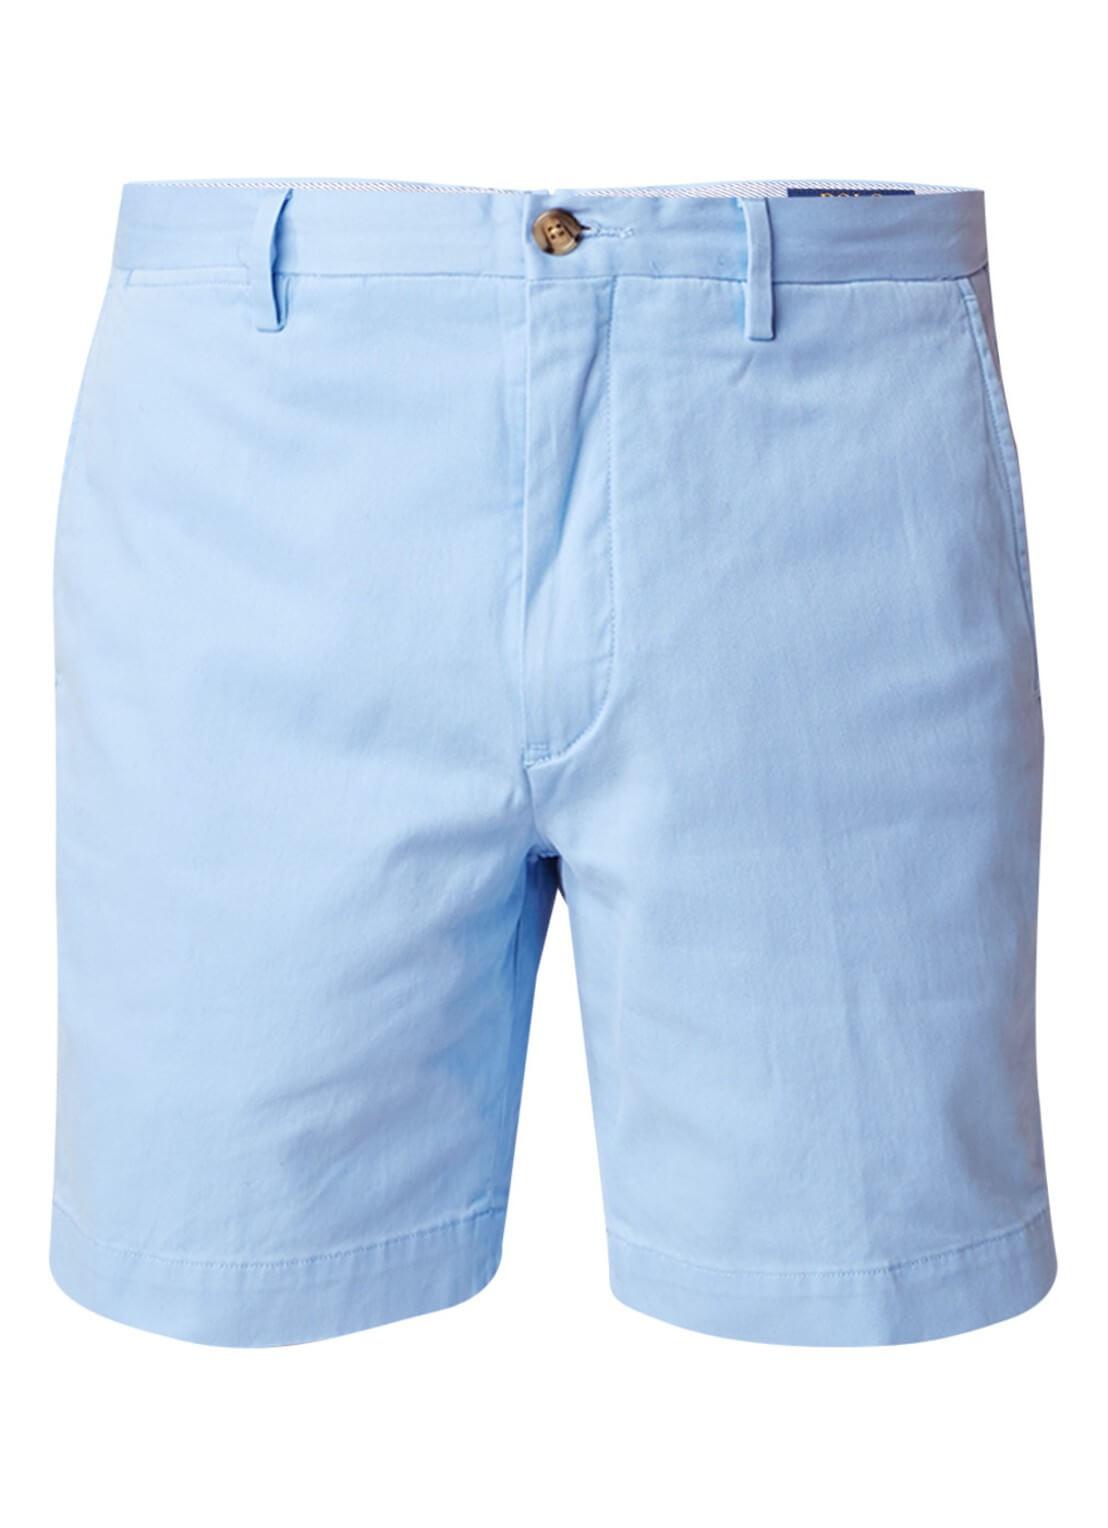 Shorts - Mr.Draper